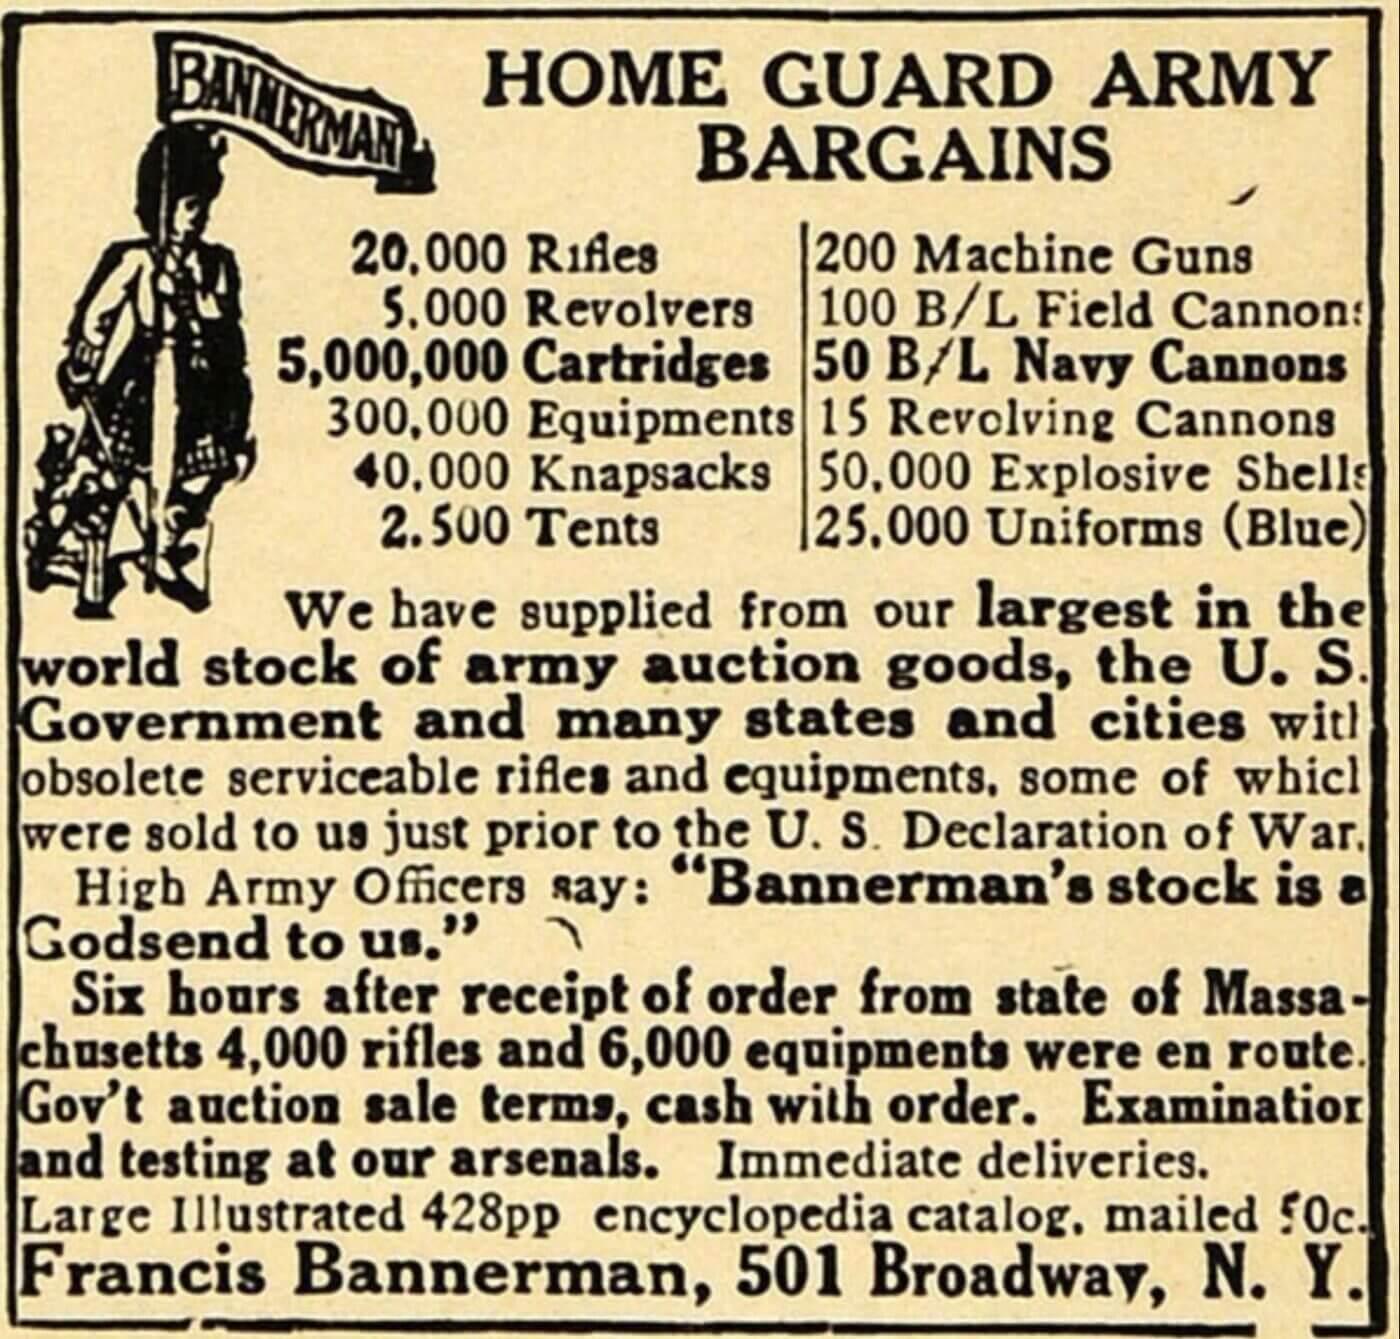 Bannerman milsurp advertisement